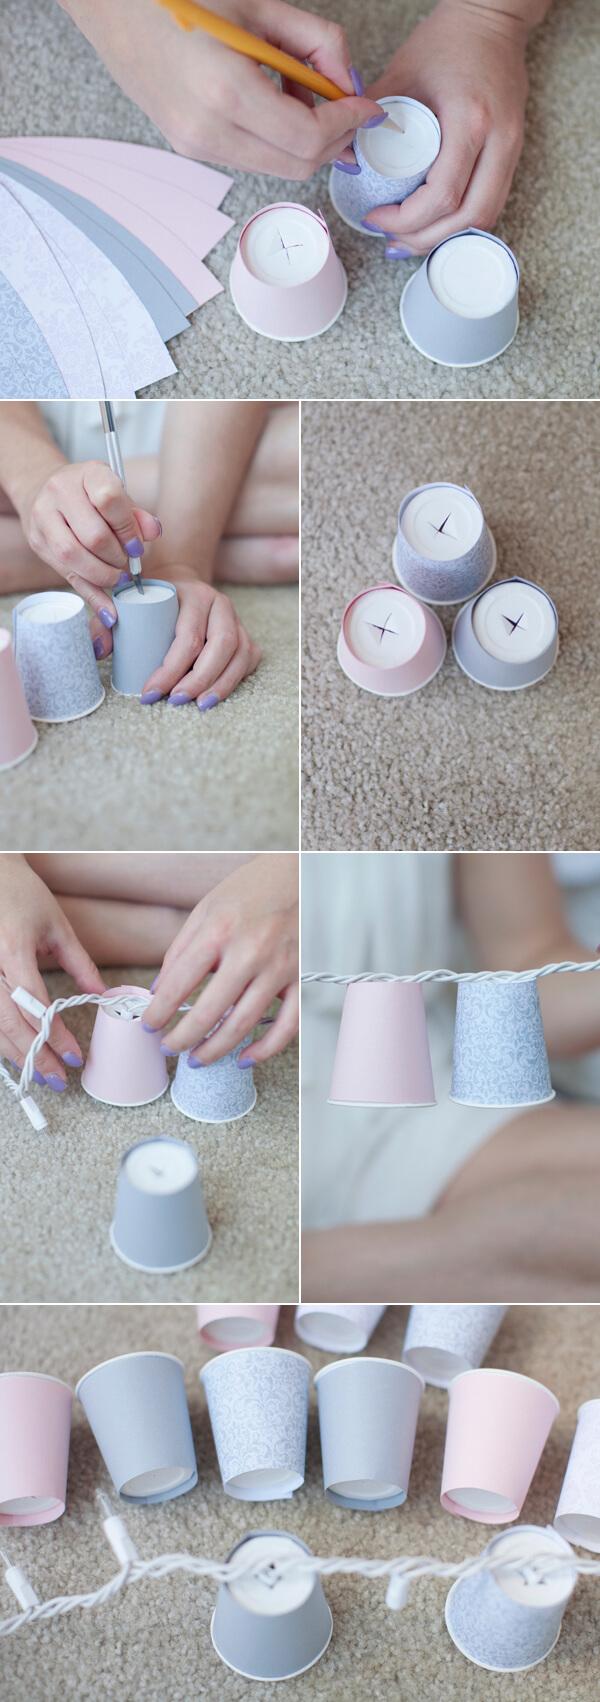 DIY-Dixie-Cup-Light-Garland-k4craft-DIY Cup String Lights - Home Decoration Ideas